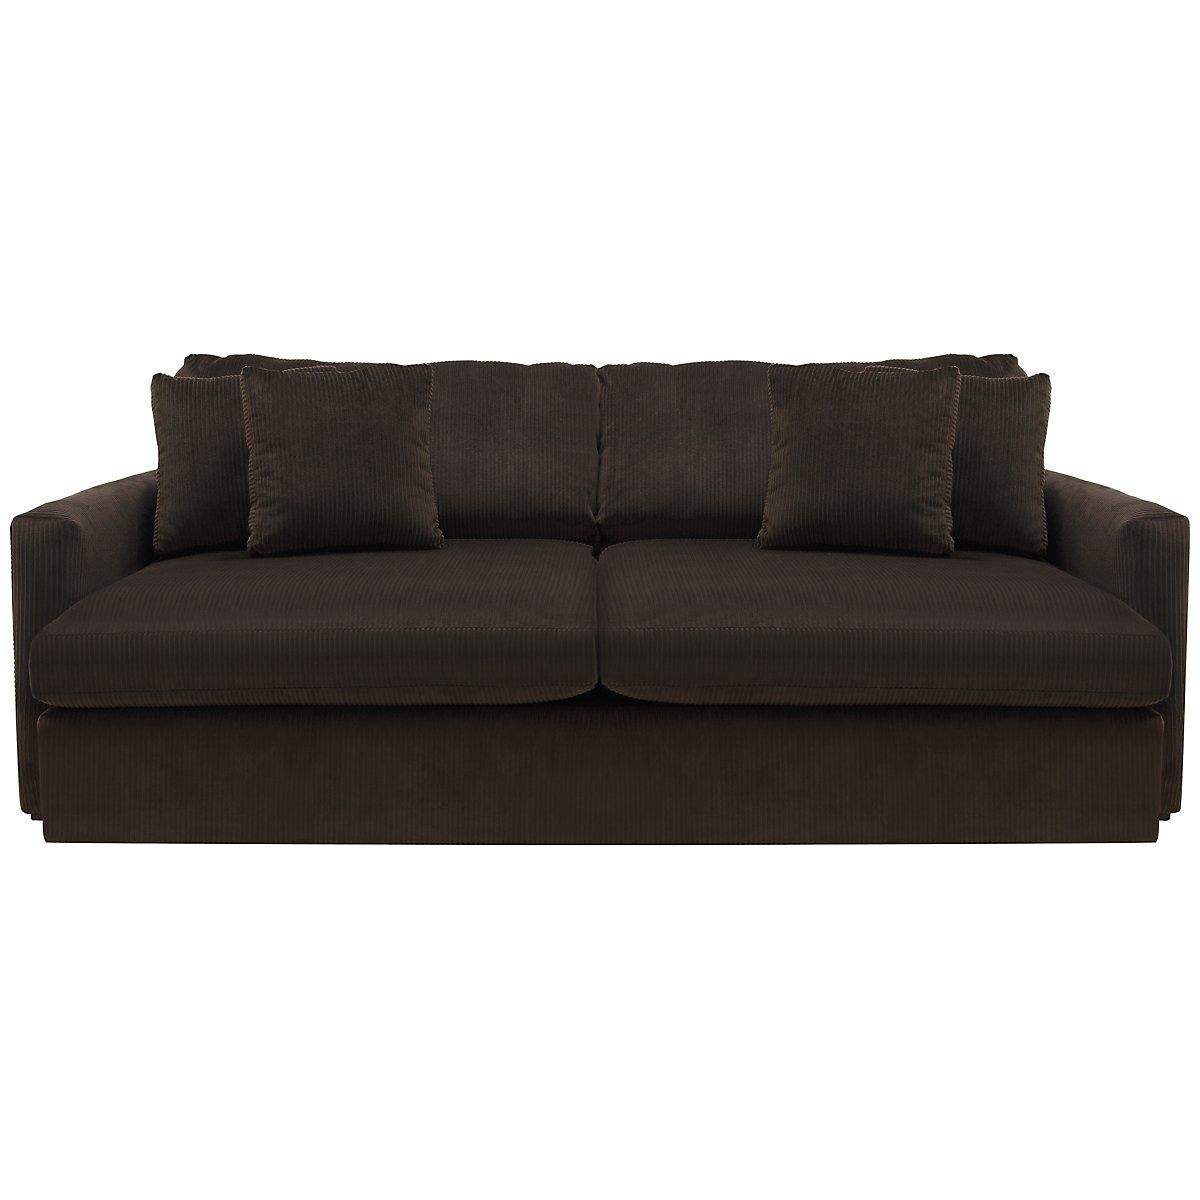 Admirable Tara2 Dark Brown Microfiber Sofa Home Sofa Microfiber Frankydiablos Diy Chair Ideas Frankydiabloscom